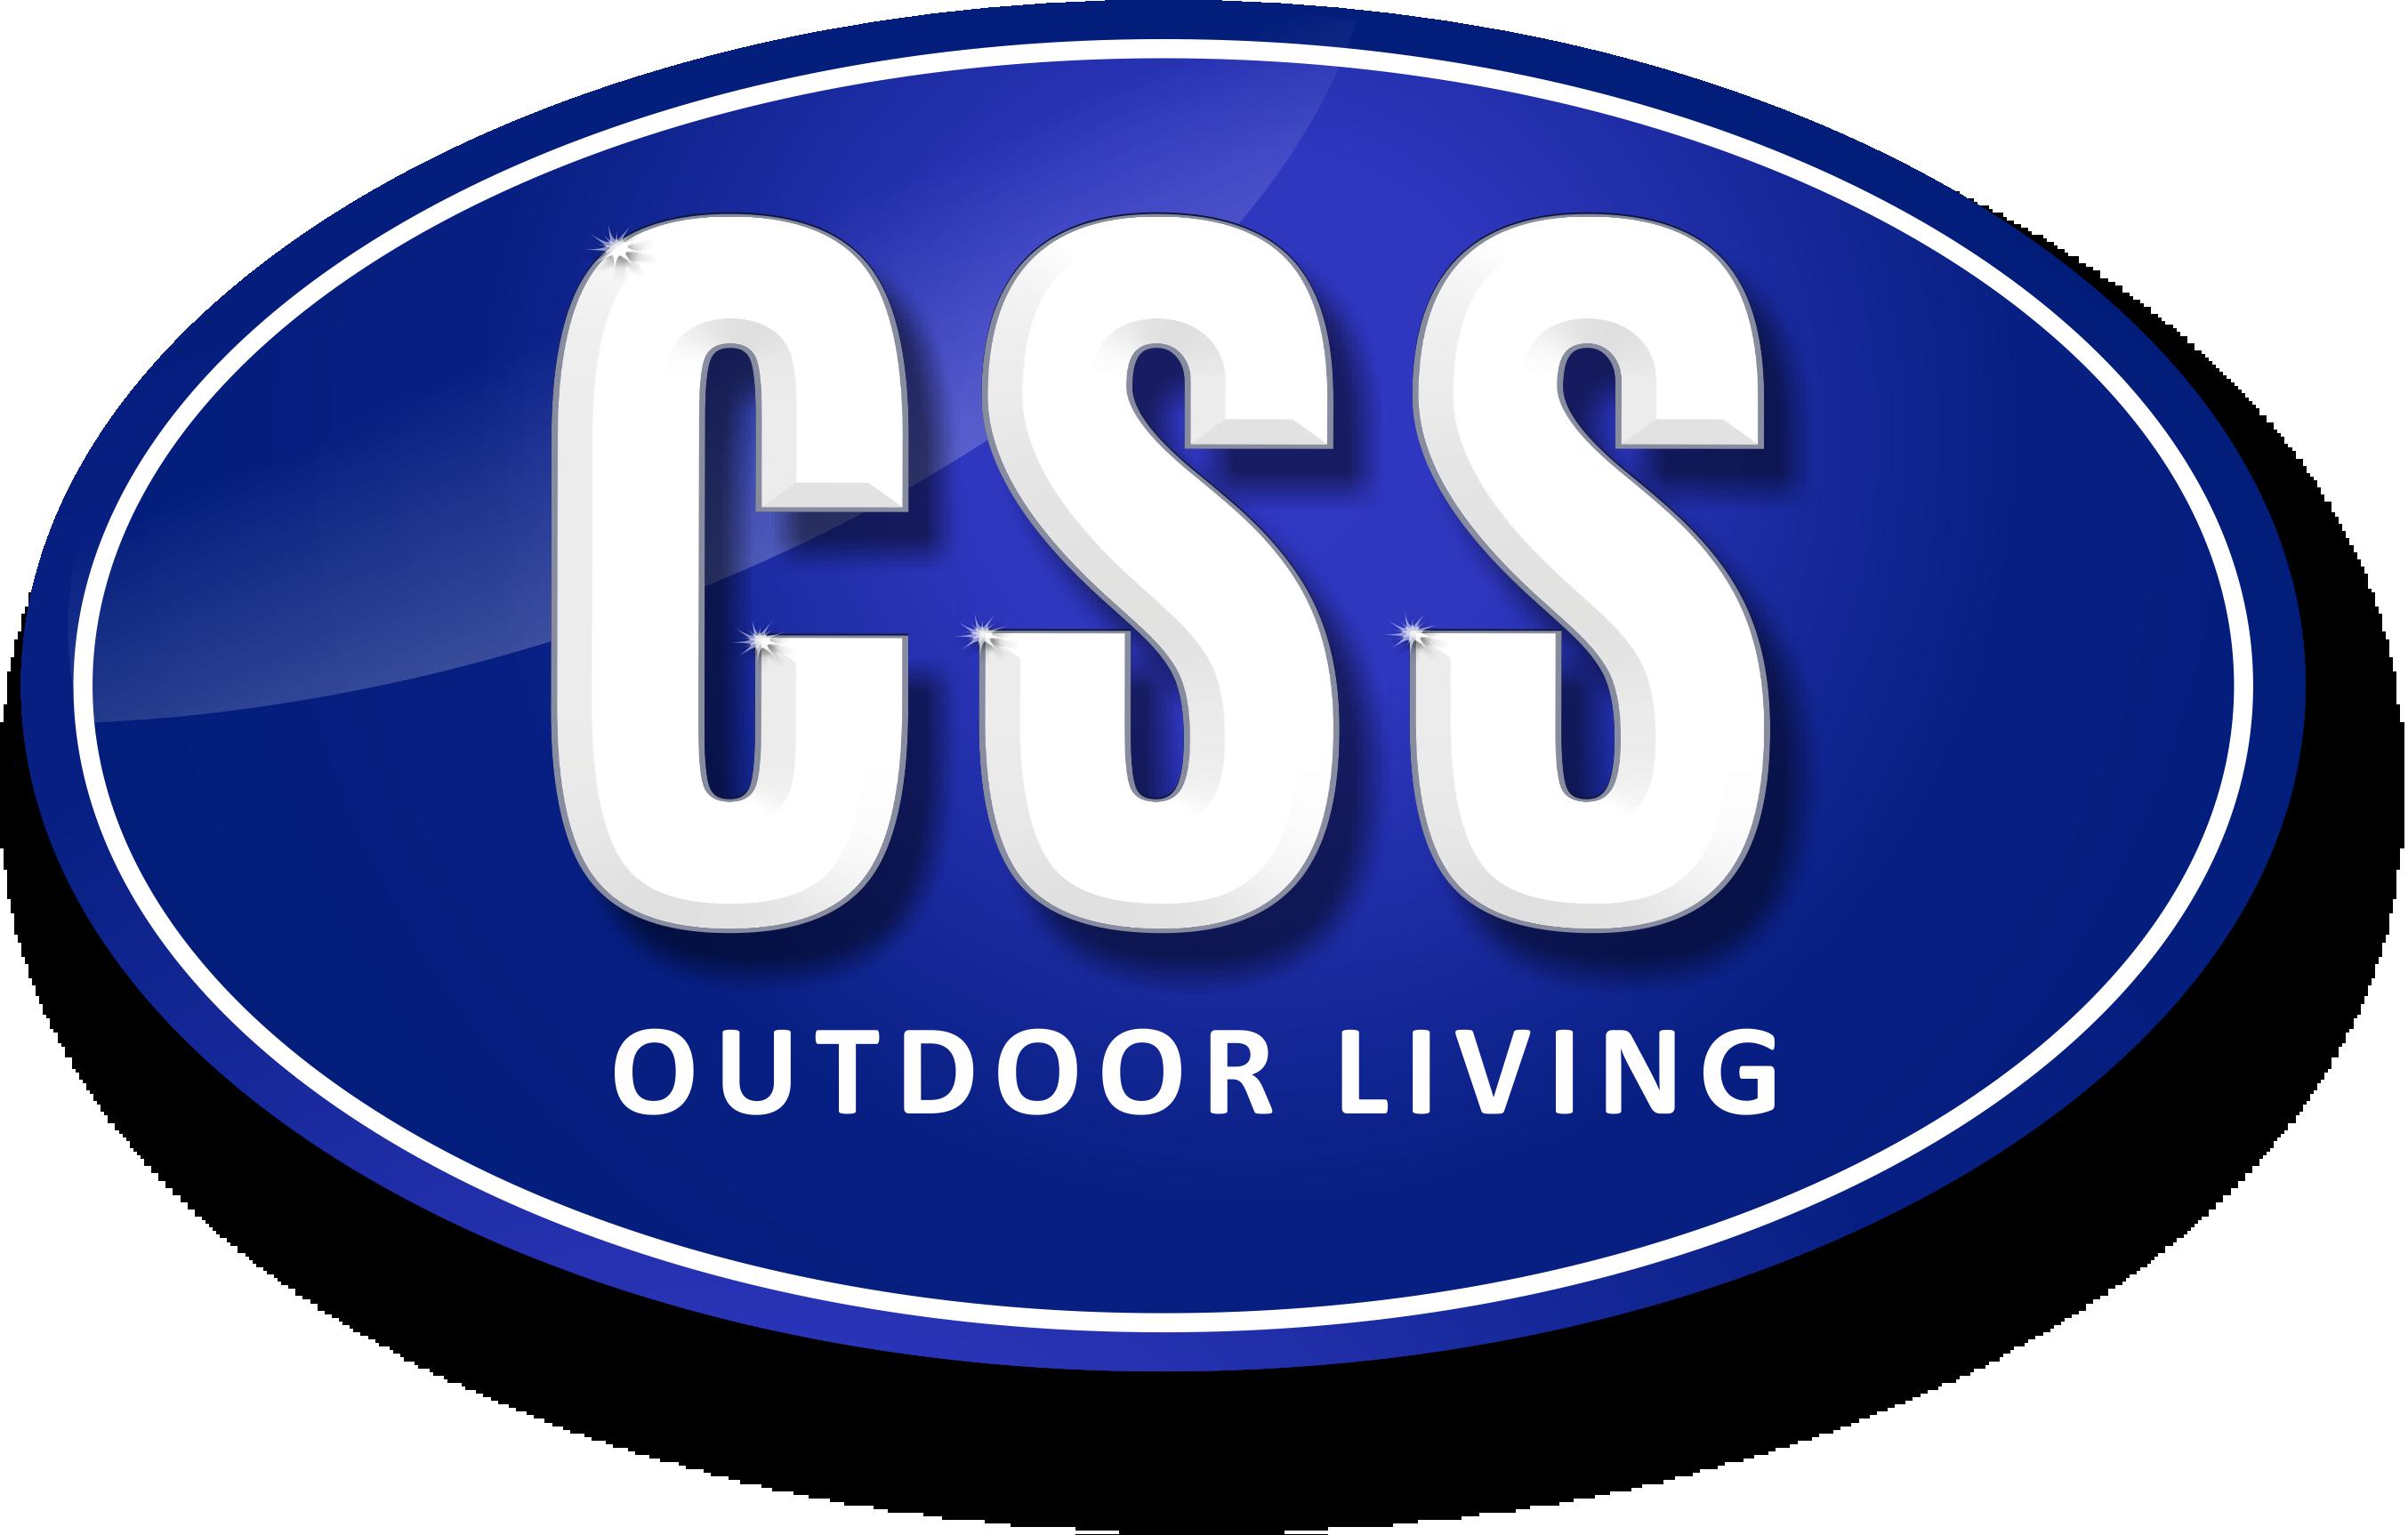 CSS Outdoor Living